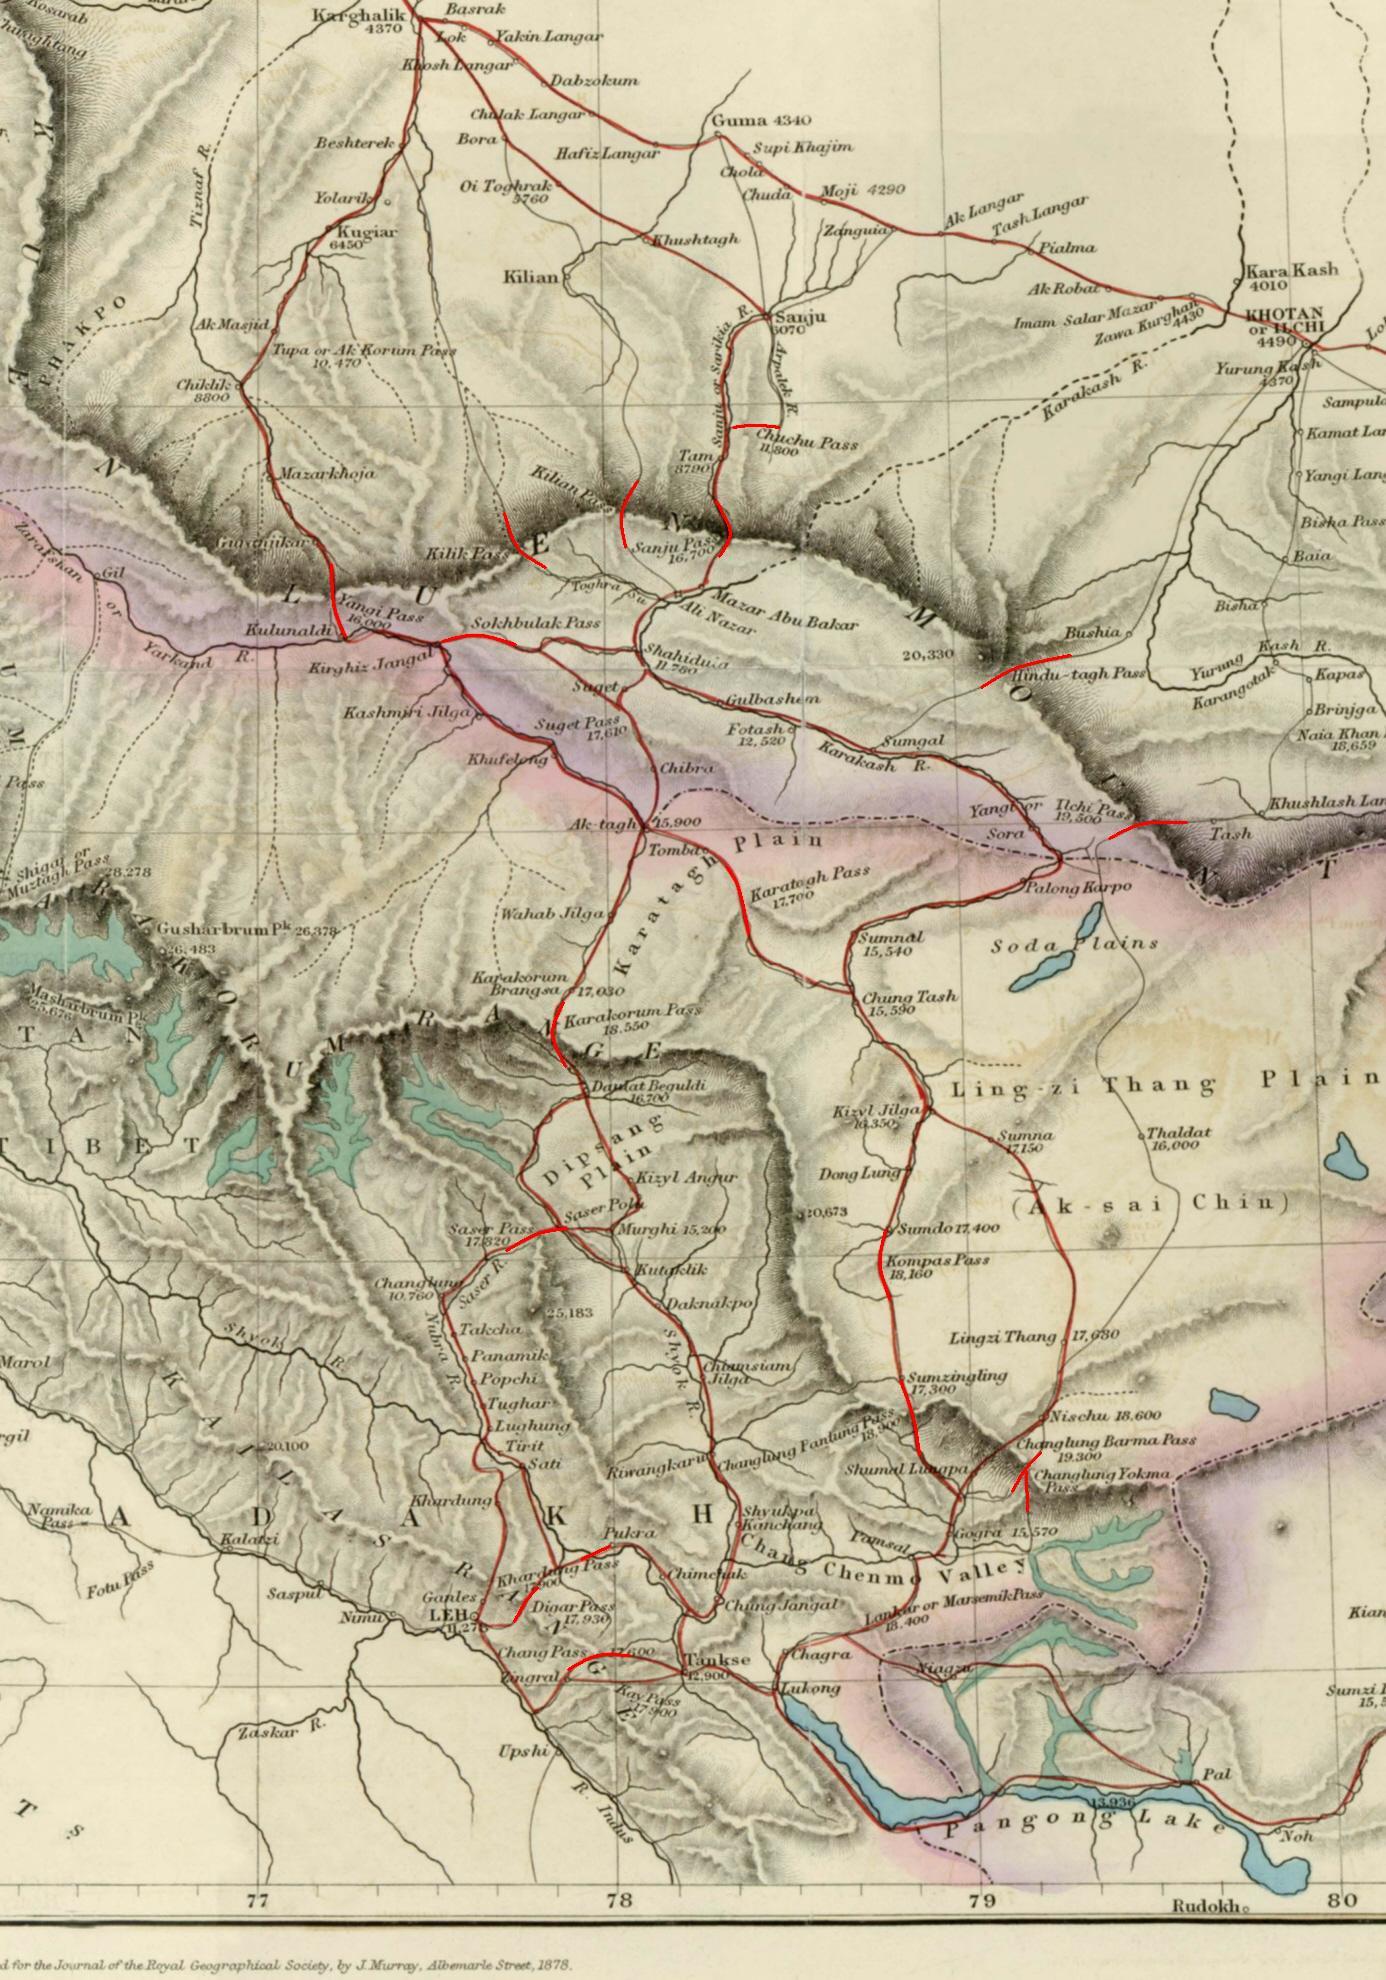 File:Hindutagh-p-aksai-chin-center2-1873.jpg - Wikimedia ... on chola incident, 1987 sino-indian skirmish, map of kunlun mountains, map of south asia, tawang town, map of tian shan, azad kashmir, sino-soviet border conflict, indo-pak war of 1971, map of spratly islands, map of south china sea, map of telangana, map of srinagar, states of india, paracel islands, kalapani river, siachen glacier, arunachal pradesh, map of patiala, map of nicobar islands, map of kashmir, kashmir conflict, indo-bangladesh enclaves, map of sikkim, sino-indian war, karakoram pass, map of punjab, line of actual control, partition of india, map of arunachal pradesh, map of taklamakan desert, map of india, china–india relations,